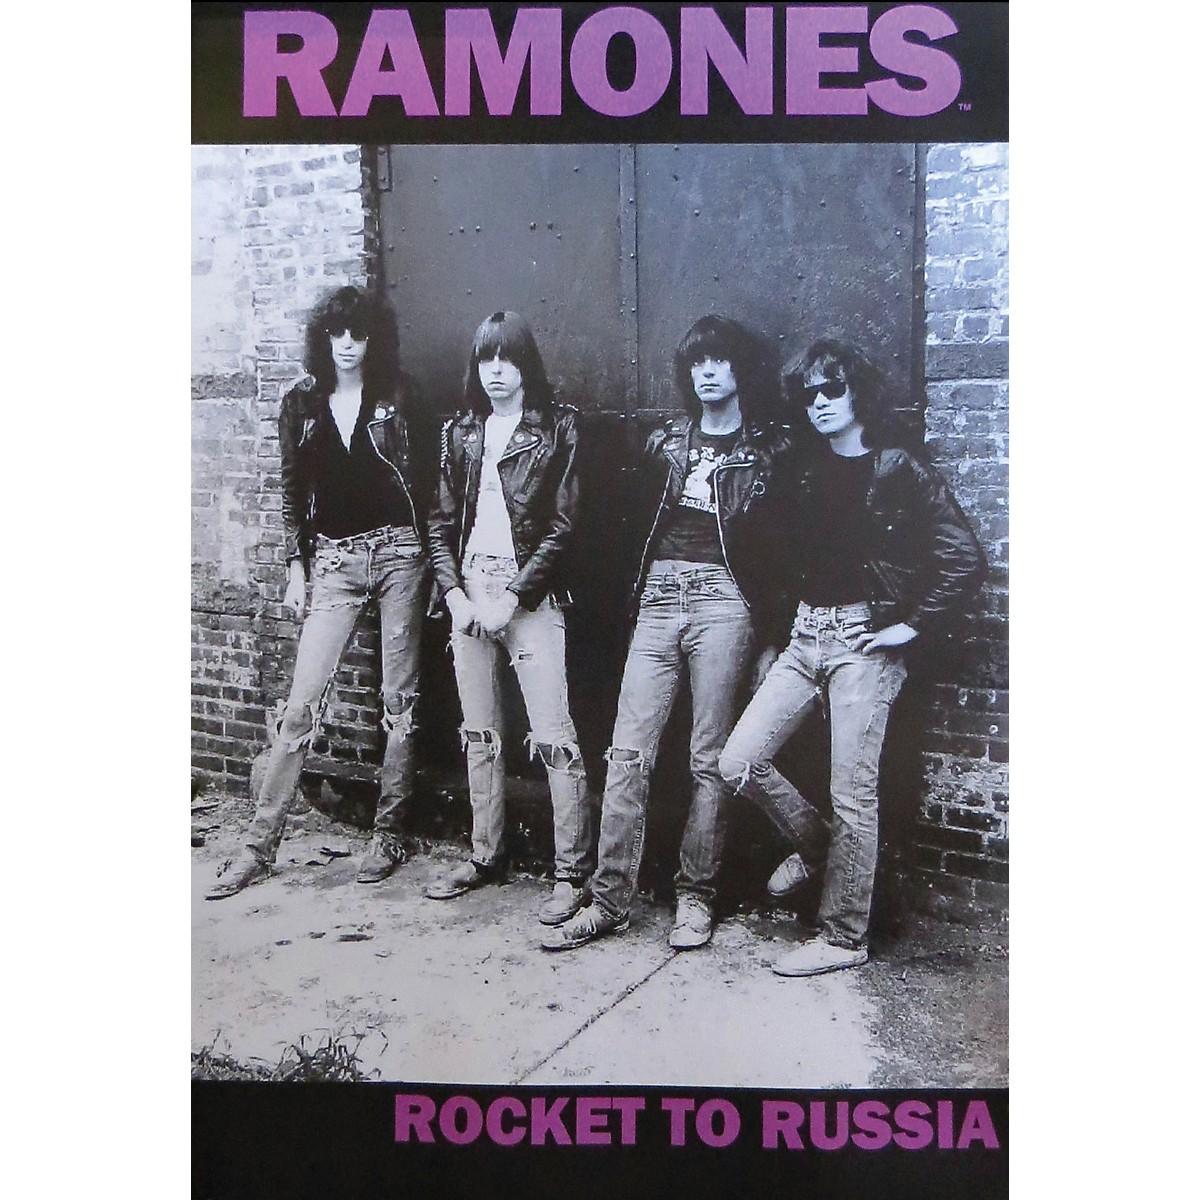 Hal Leonard The Ramones - Rocket to Russia - Wall Poster